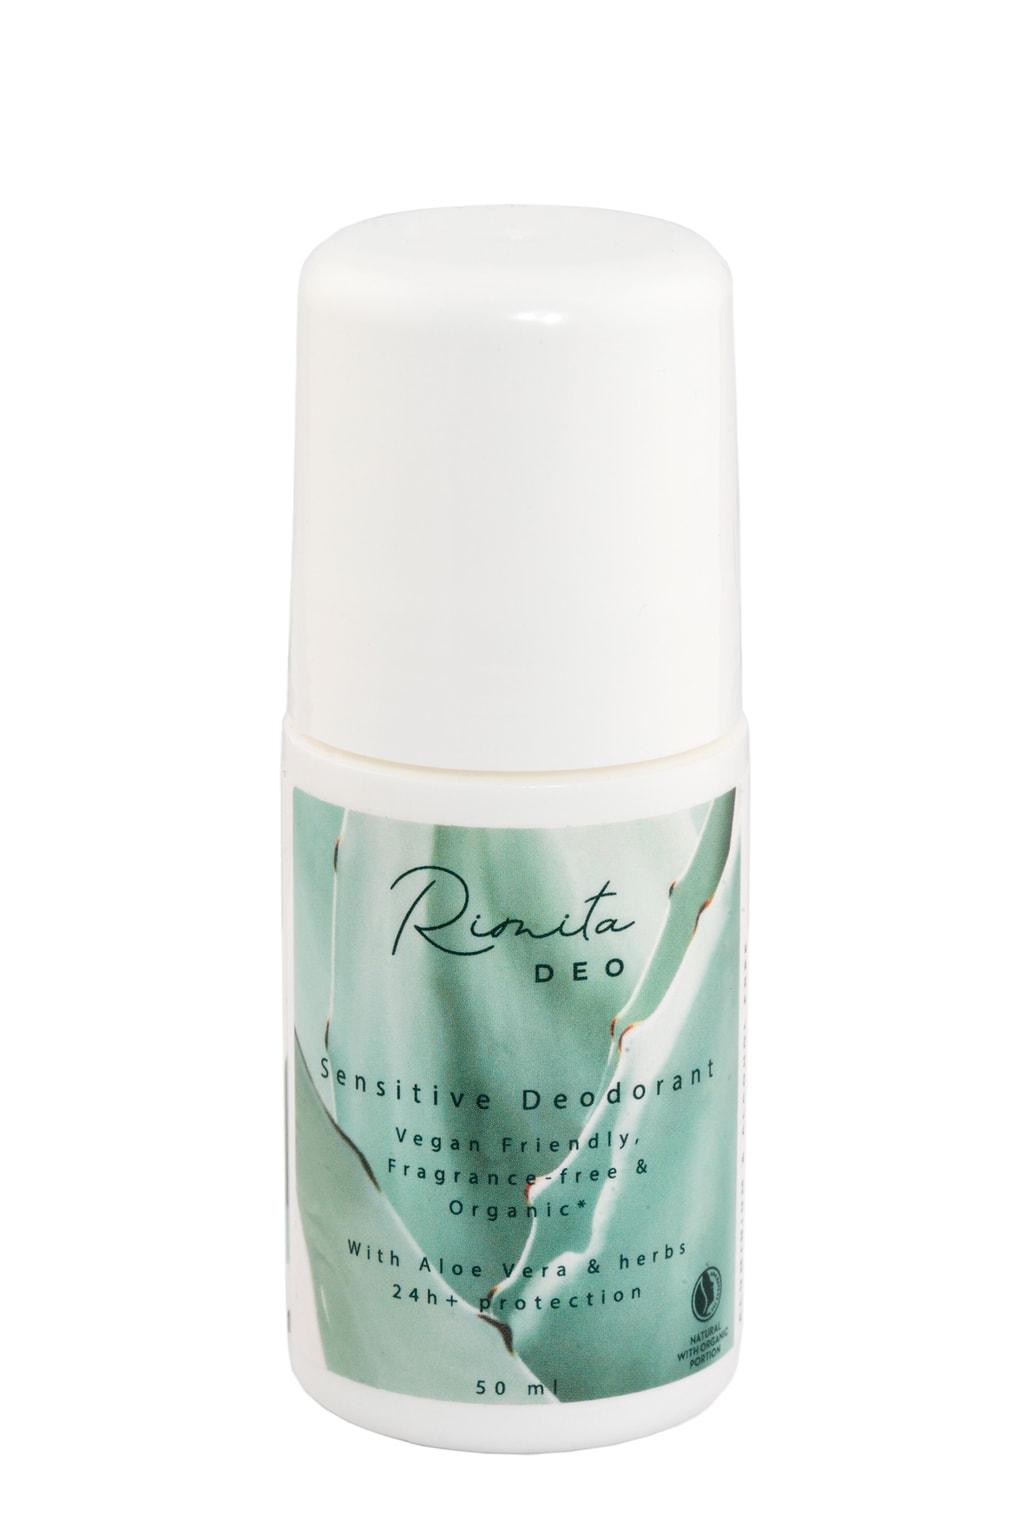 Rimita Green Sensitive deodorantti, 50ml